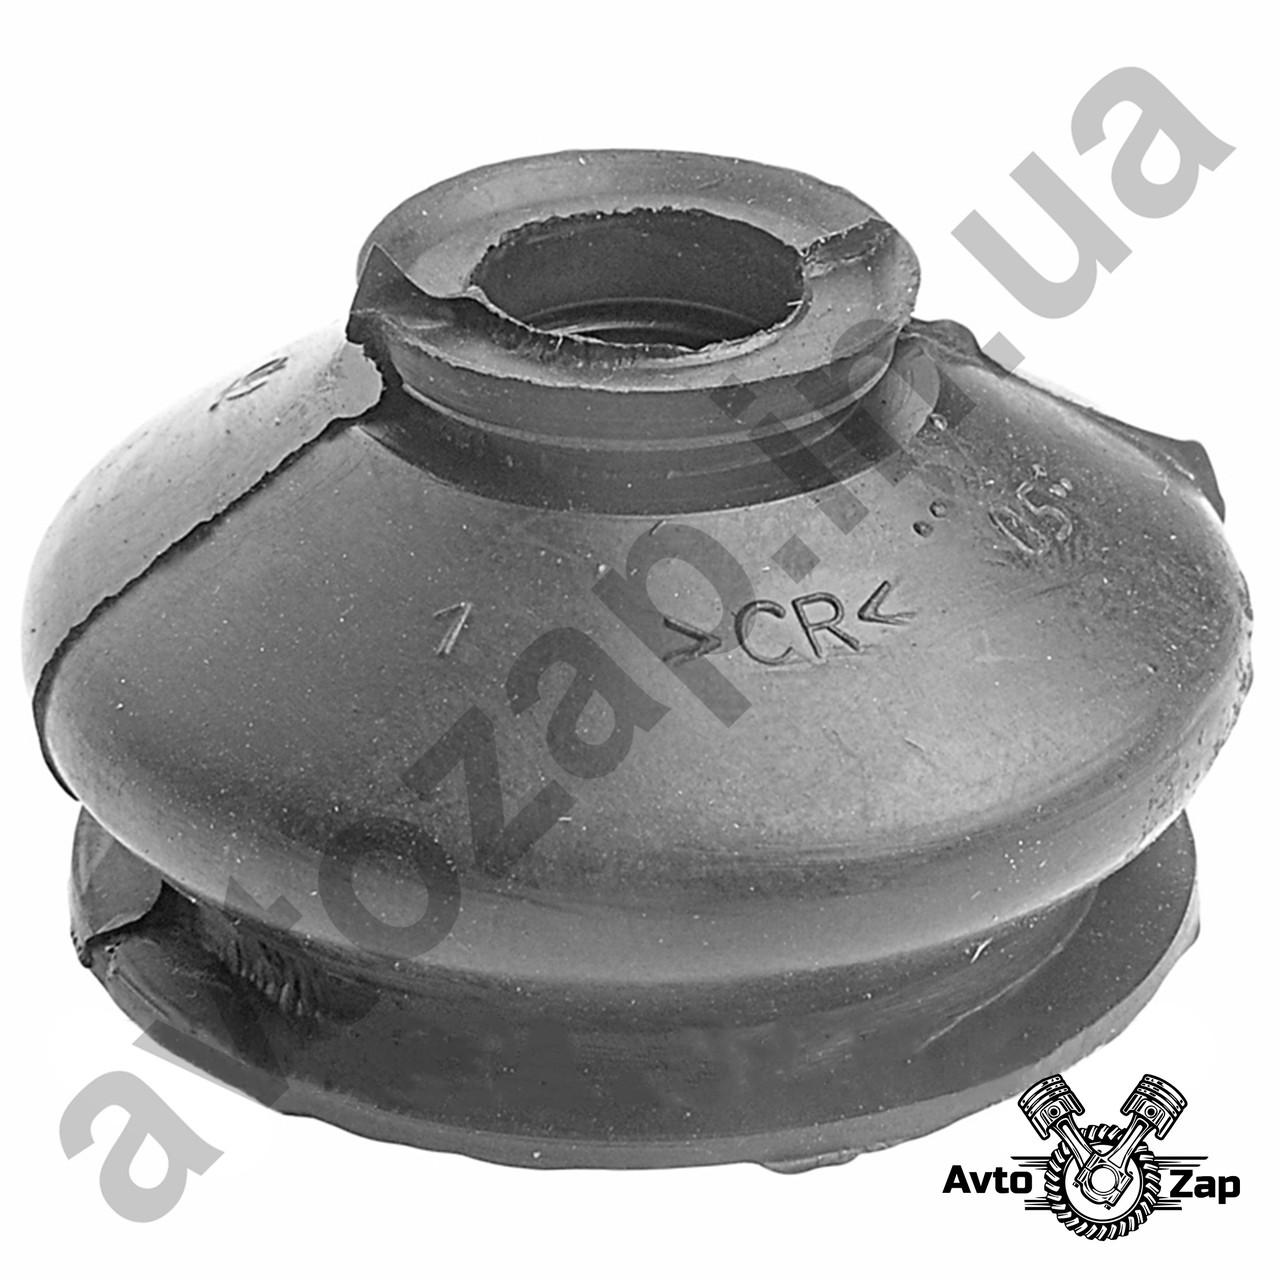 Фильтр масляный  ВАЗ 2108-15 Стандарт, кор.уп. НФ 05-М   01247